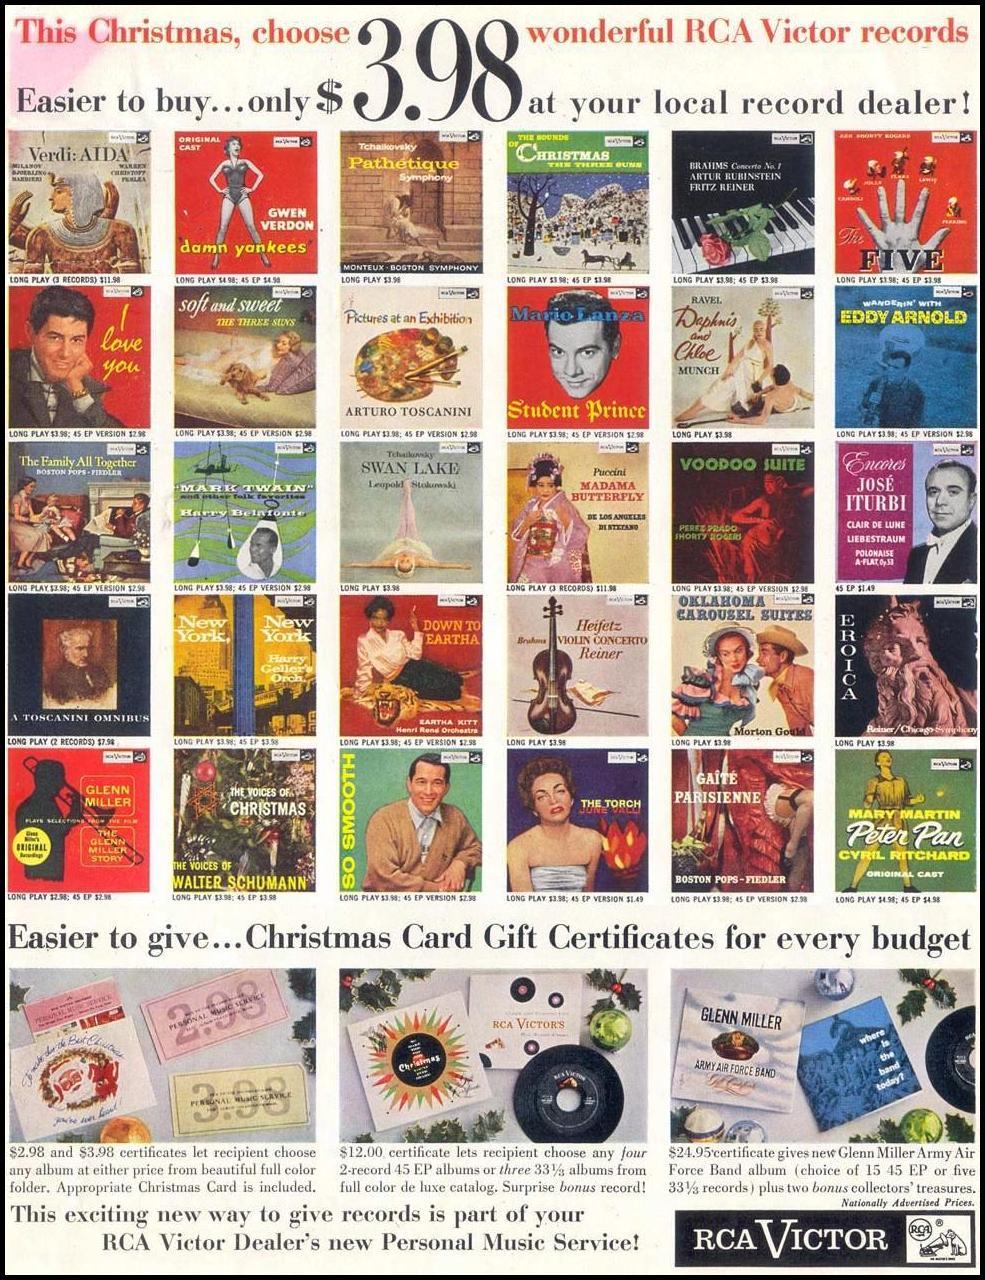 RCA VICTOR RECORDS SATURDAY EVENING POST 12/10/1955